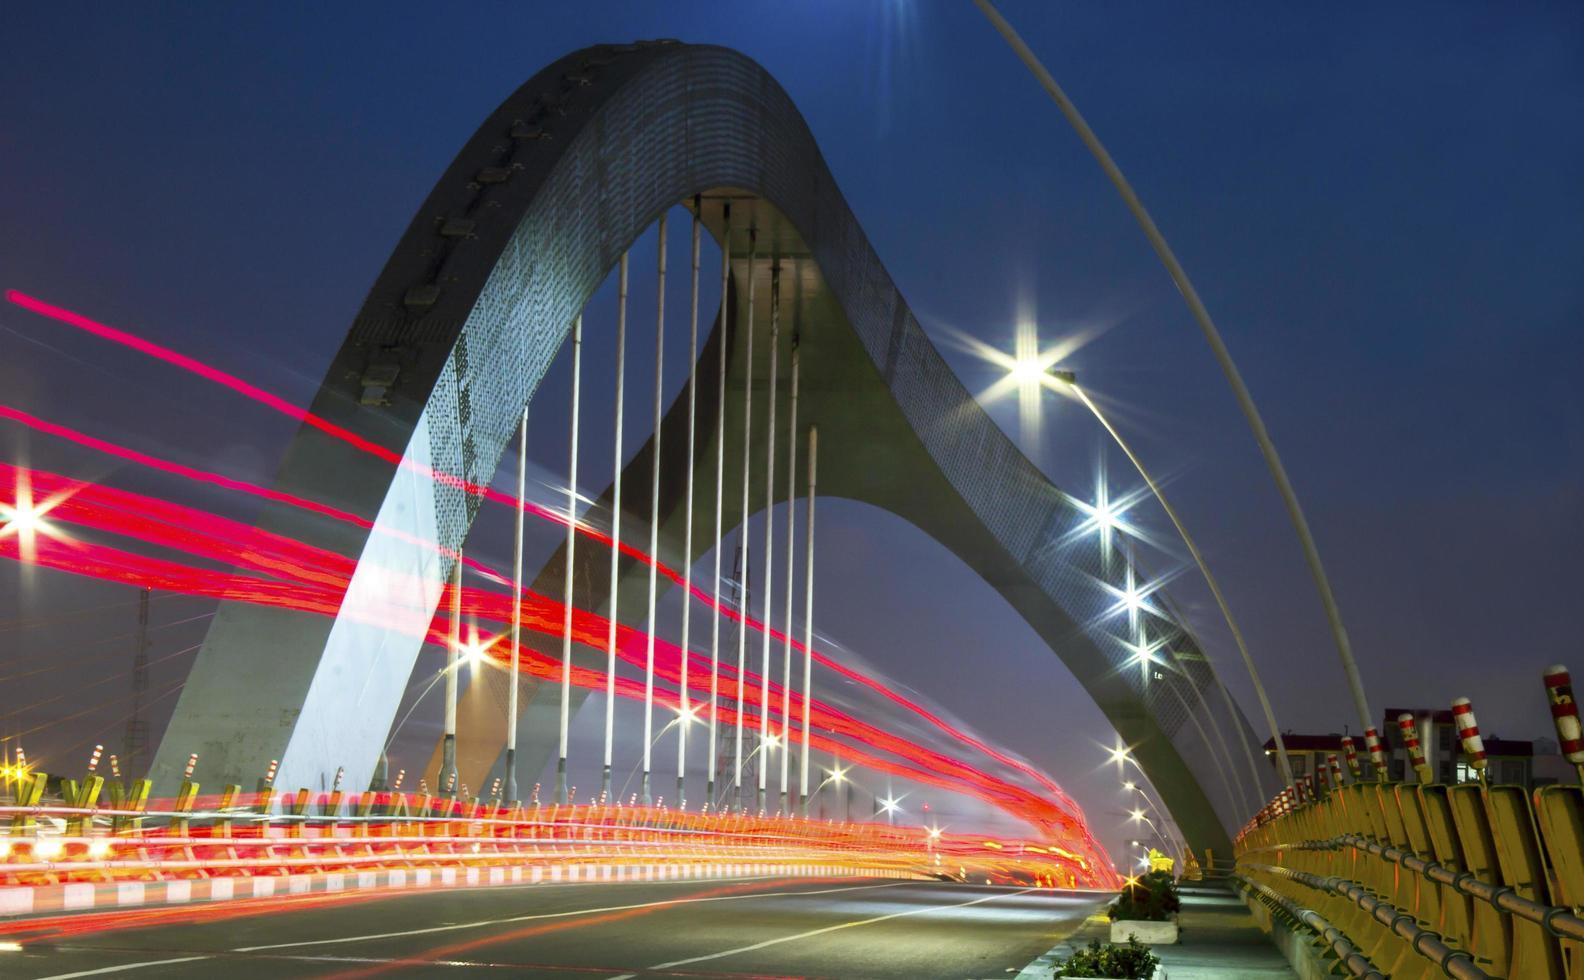 Bridge structure at night photo